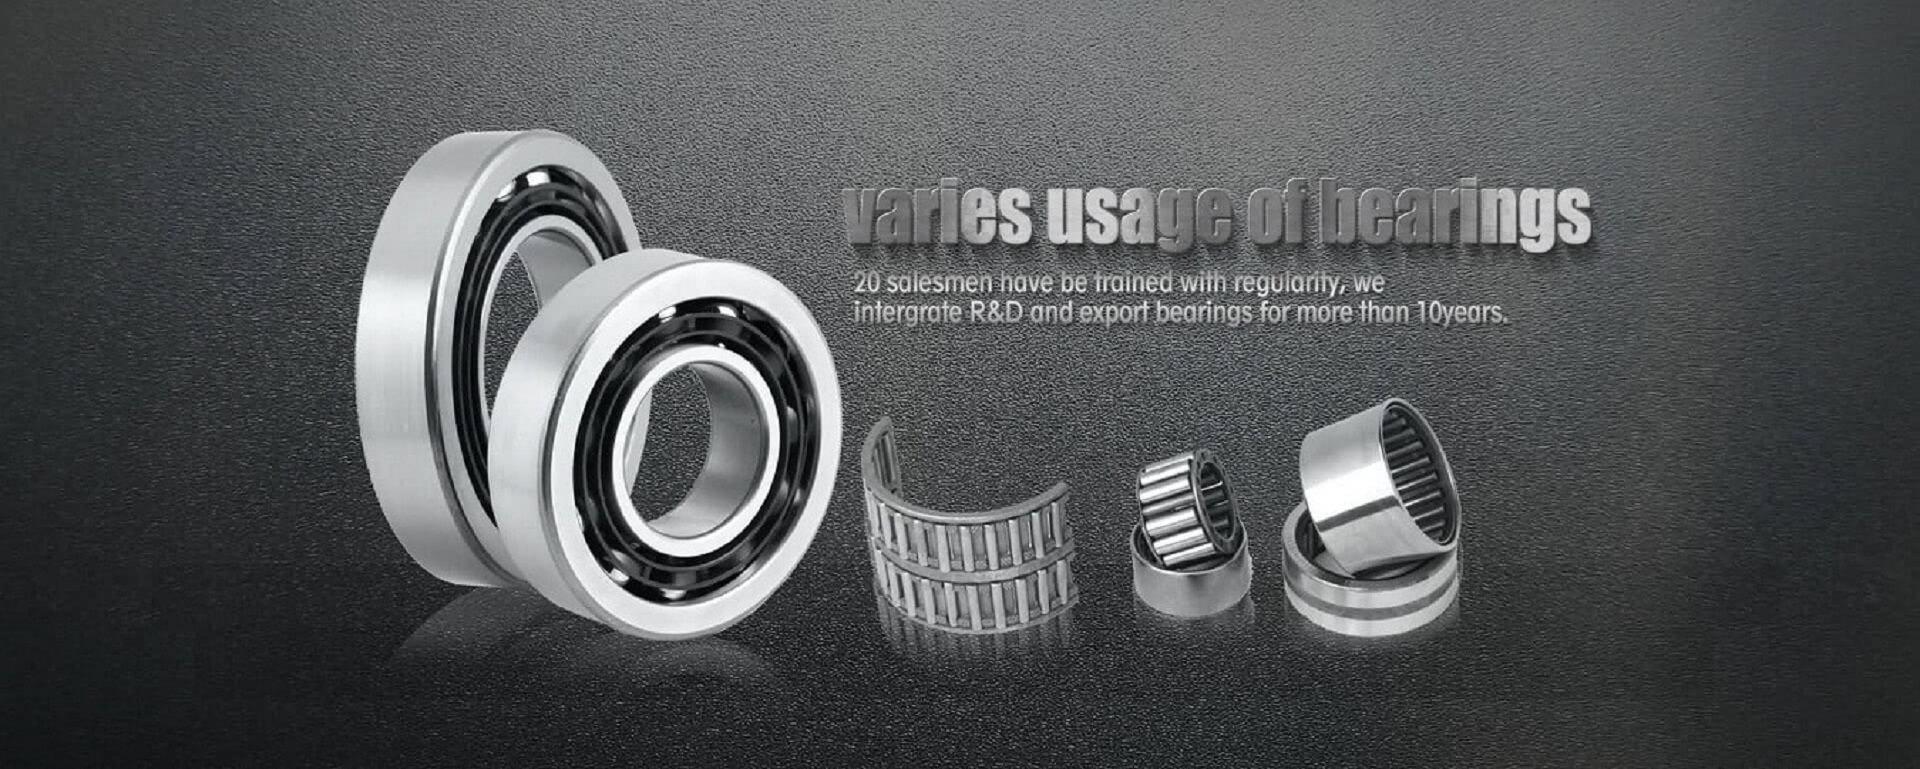 ntn bearing-fag bearing-nachi bearing-nsk bearing-high quality bearing